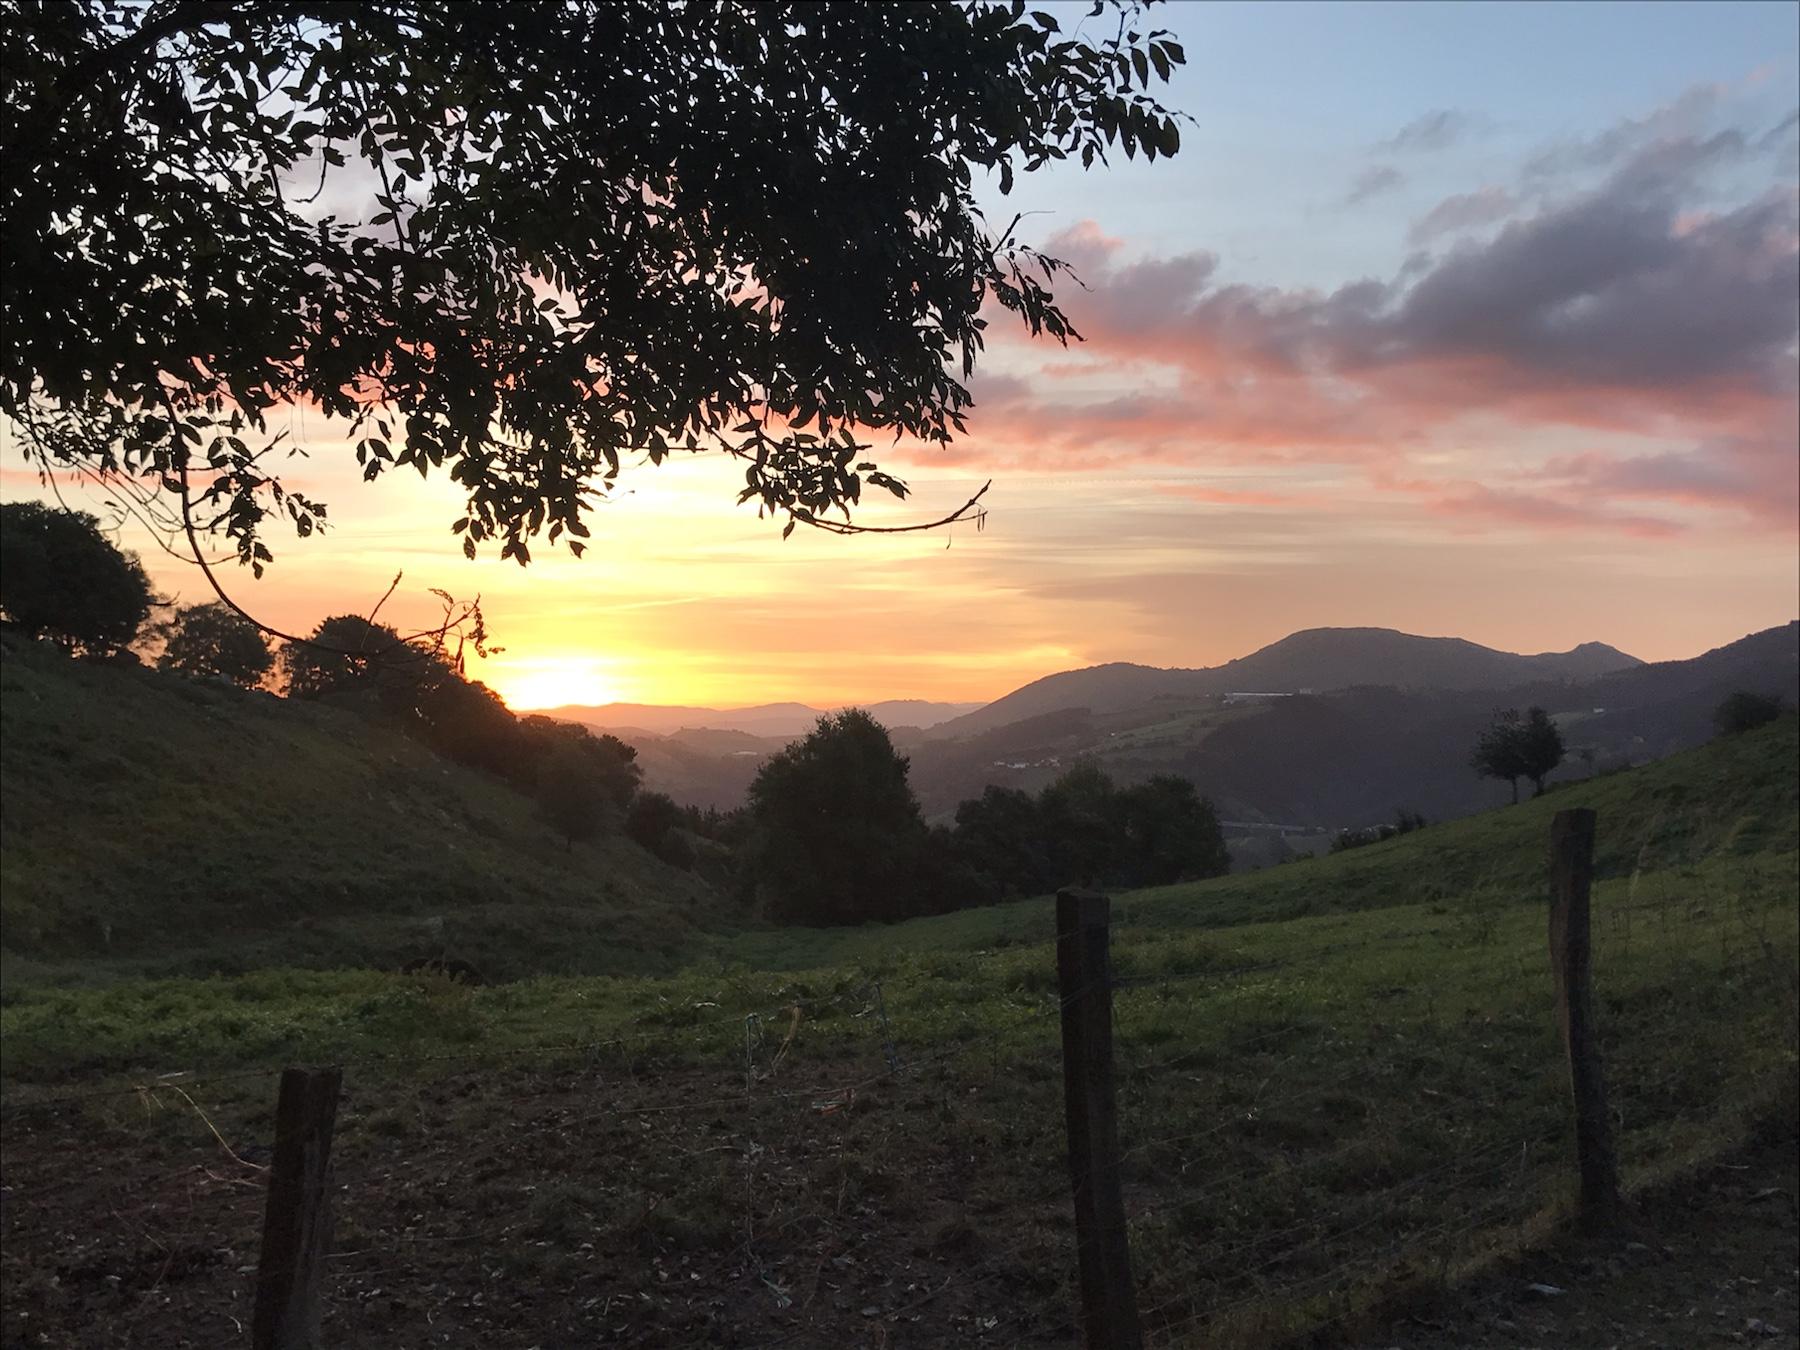 Sonnenaufgang Camino del Norte, Kategorie Aussicht, #fopanet Fotoparade